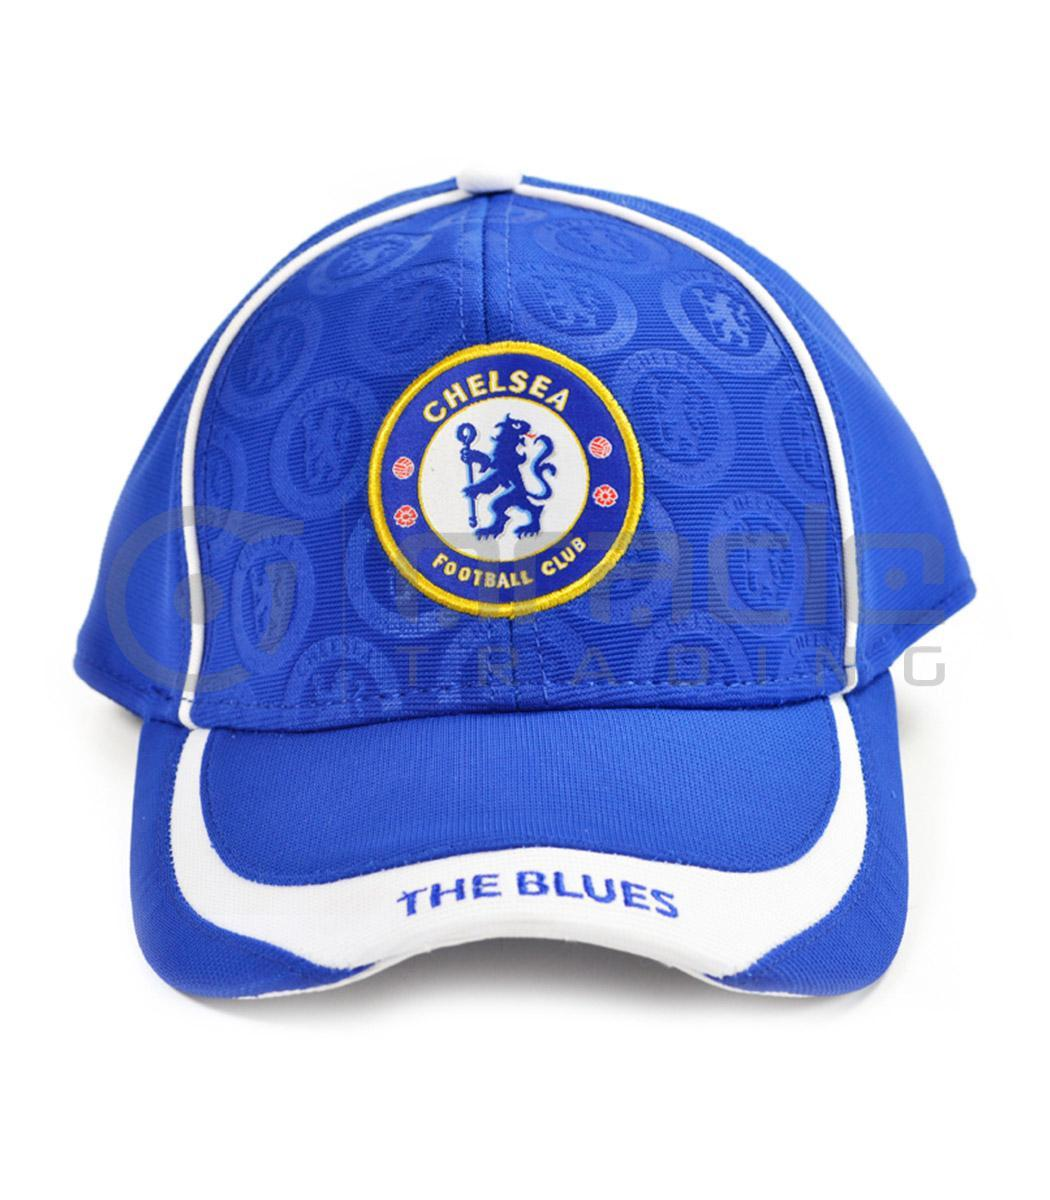 Chelsea Debossed Crest Hat